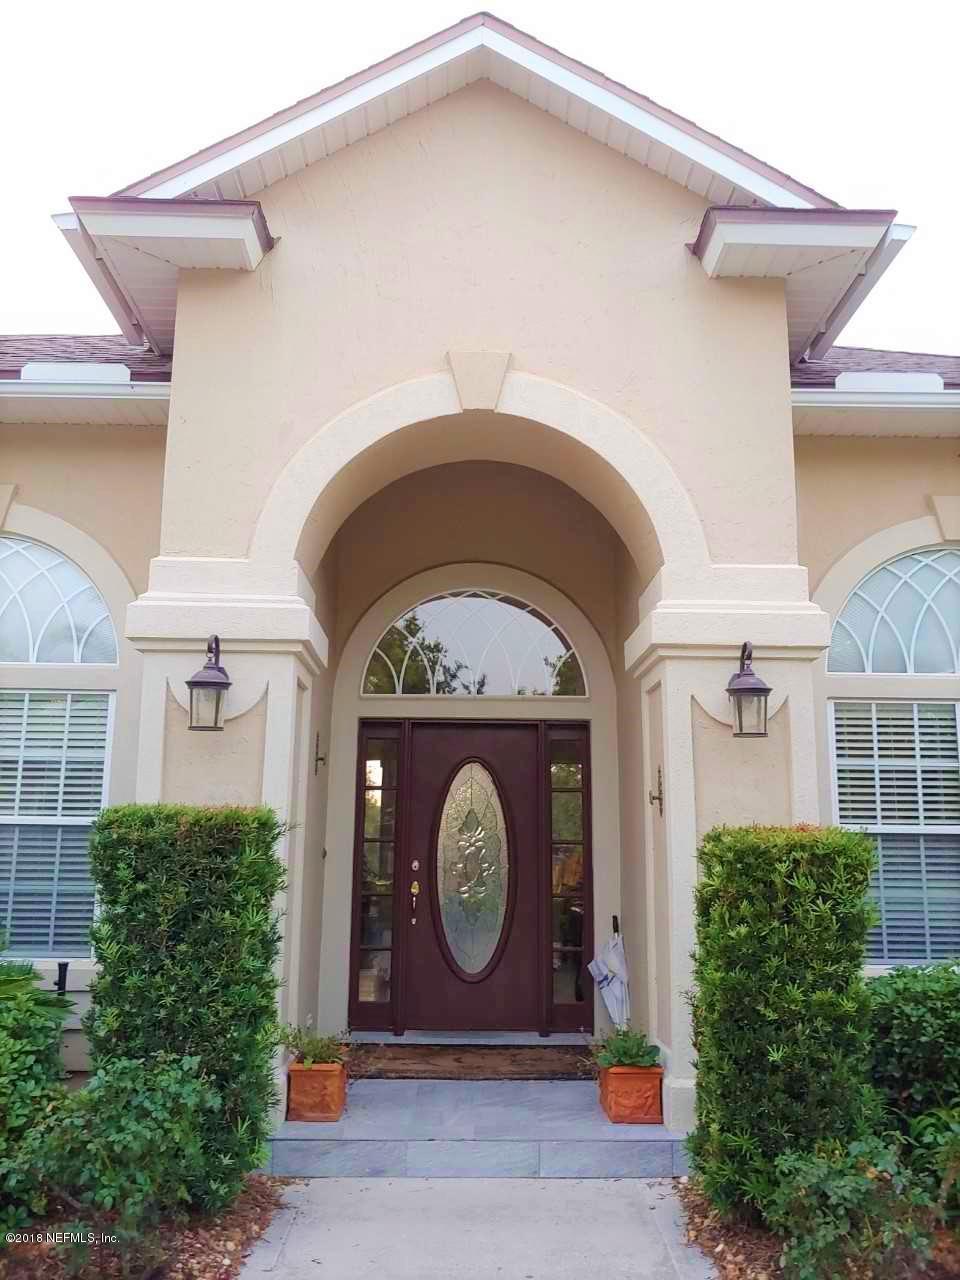 164 PINEHURST POINTE, ST AUGUSTINE, FLORIDA 32092, 4 Bedrooms Bedrooms, ,4 BathroomsBathrooms,Residential - single family,For sale,PINEHURST POINTE,969622